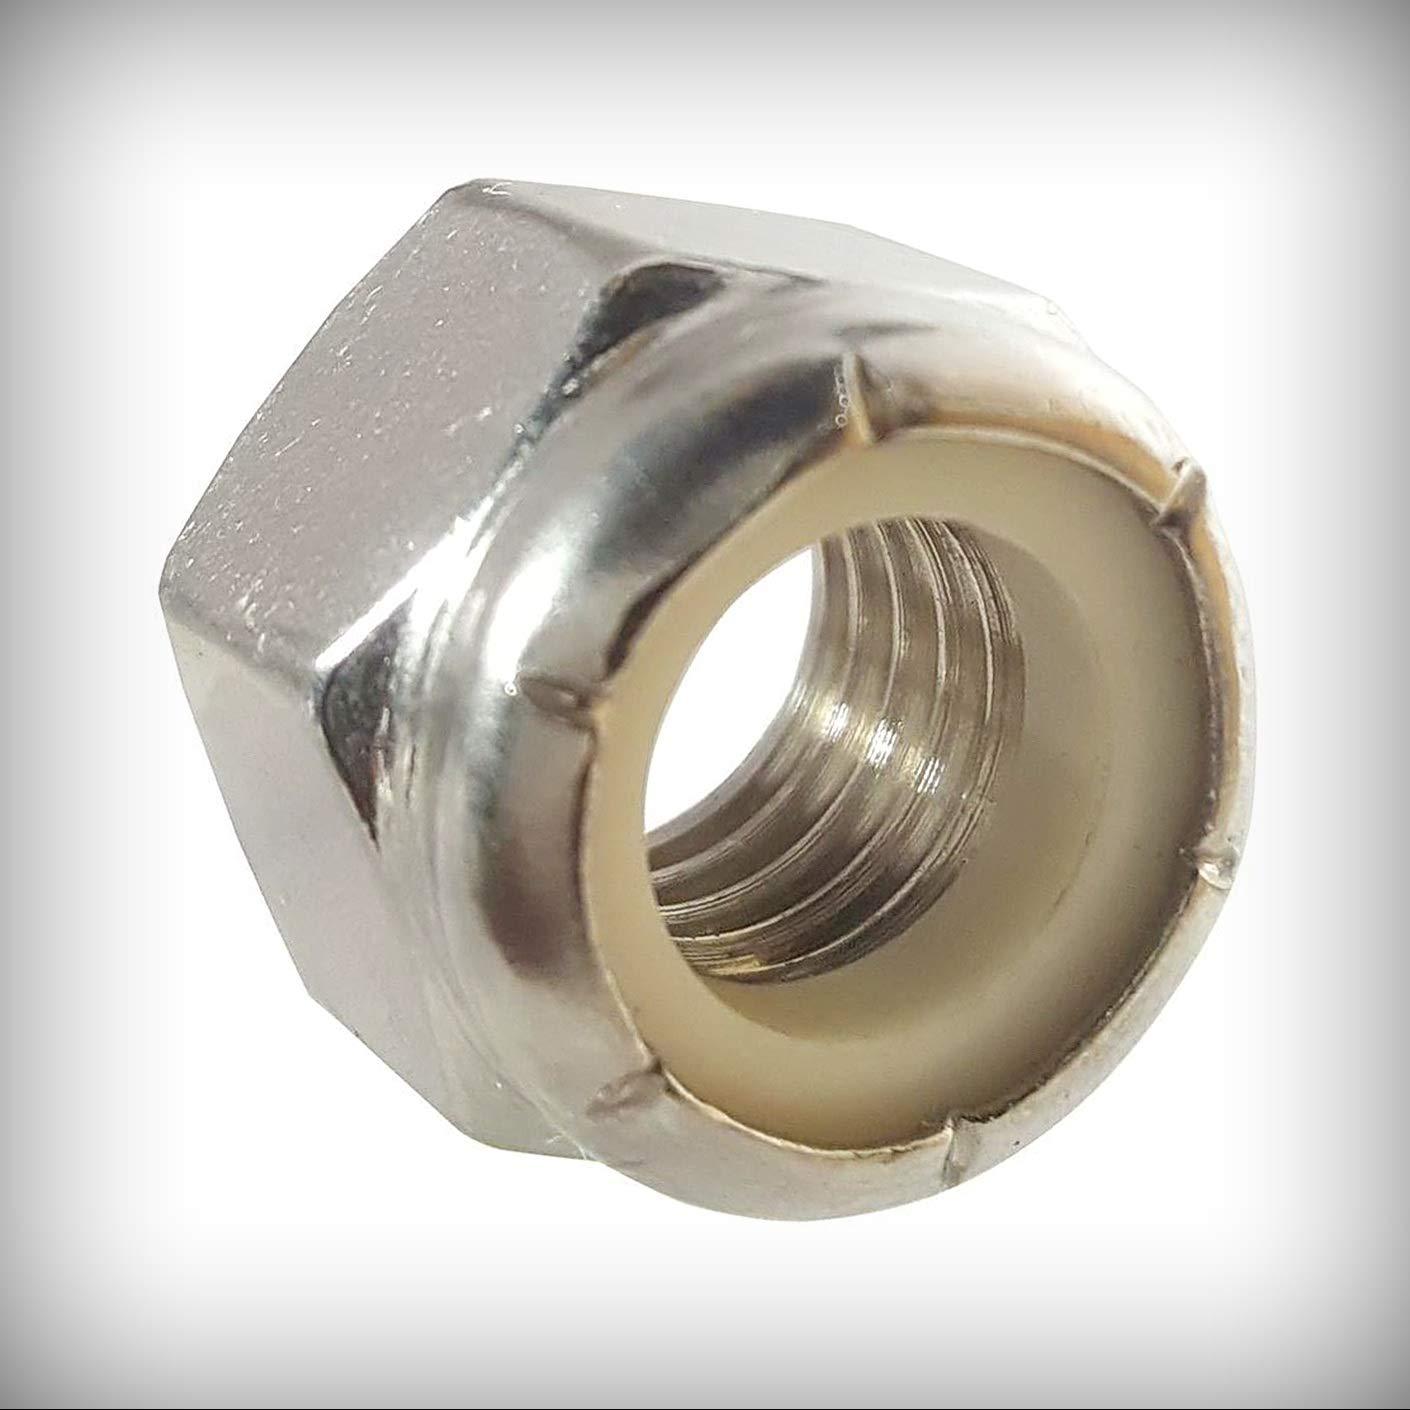 New Lot of 50 Pcs 1-8 Nylon Excellence Elasti Steel 18-8 Stainless Nut Ranking TOP7 Lock